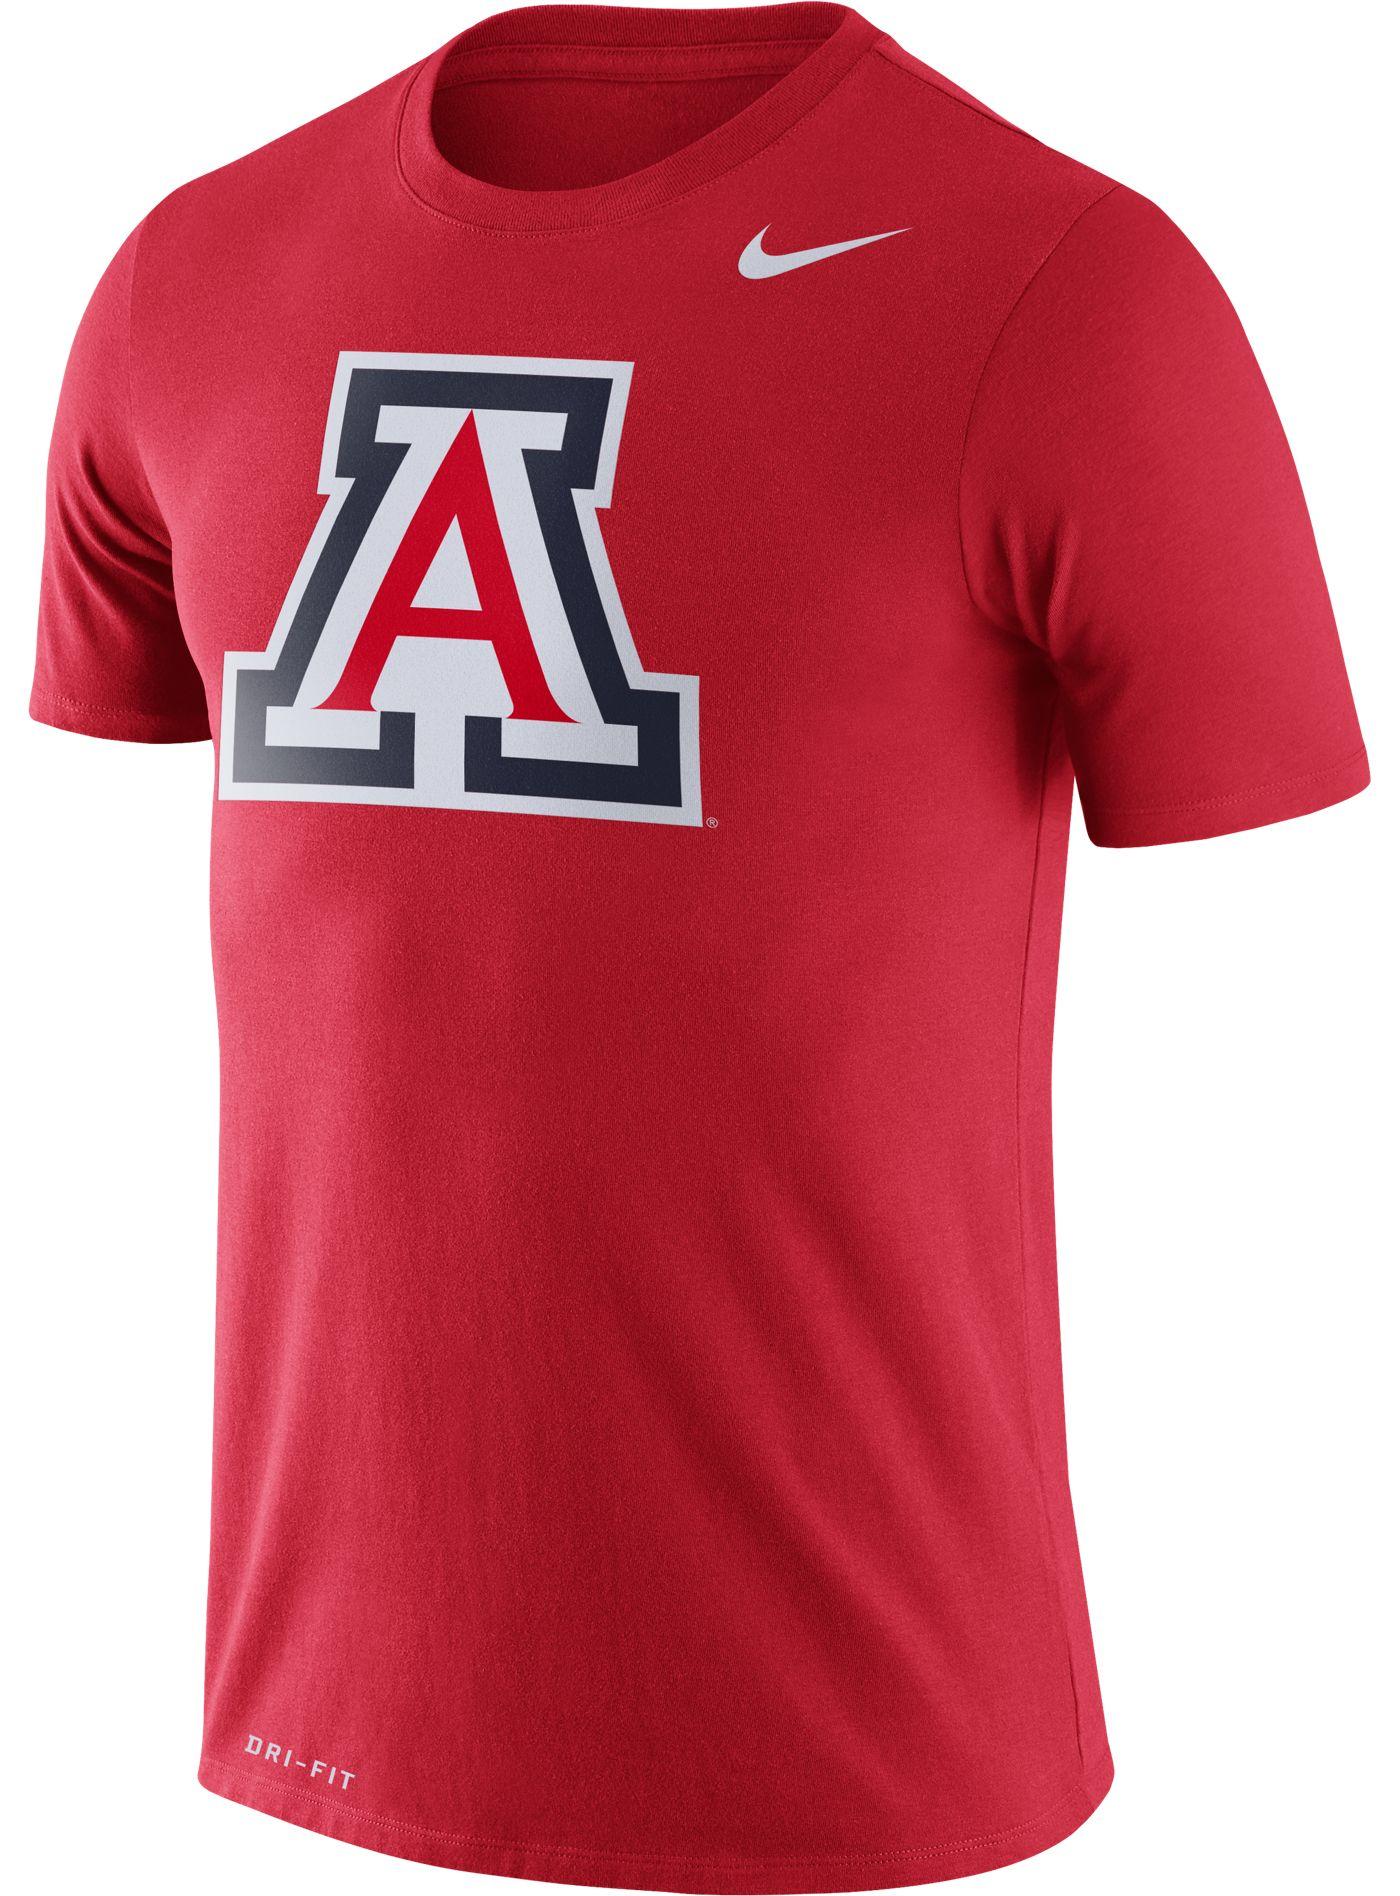 Nike Men's Arizona Wildcats Red Logo Dry Legend T-Shirt